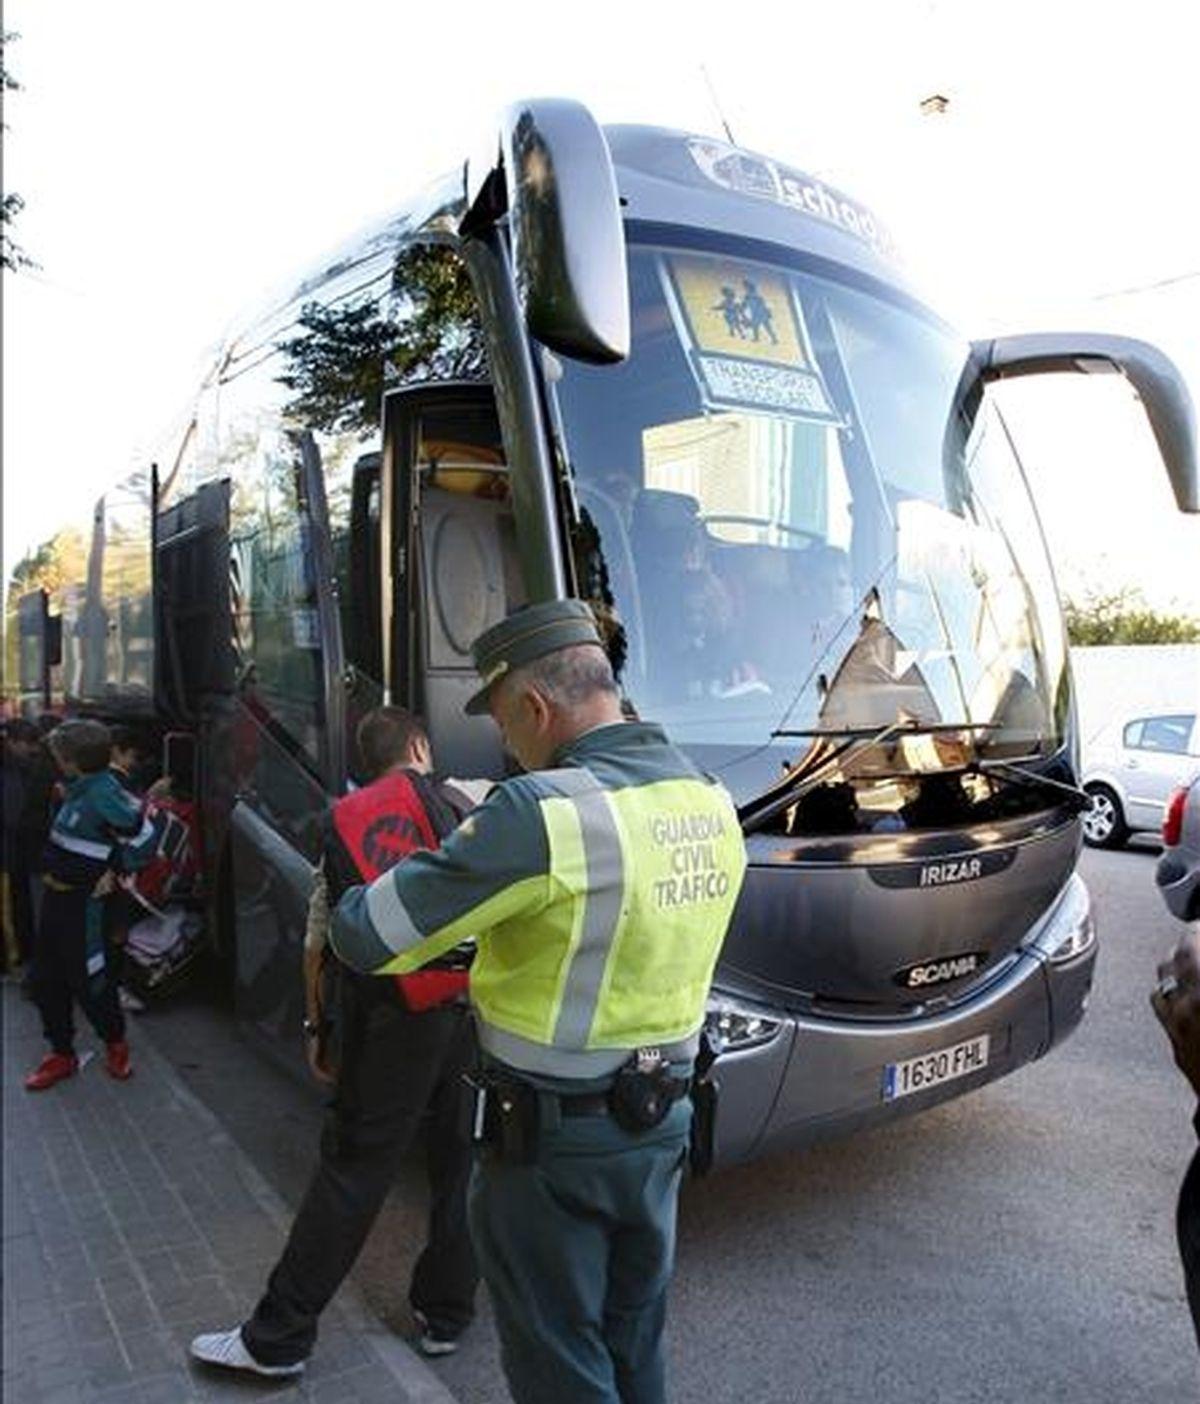 Un guardia civil revisa los papeles de un autobús de transporte escolar en Torrejón de la Calzada (Madrid). EFE/Archivo